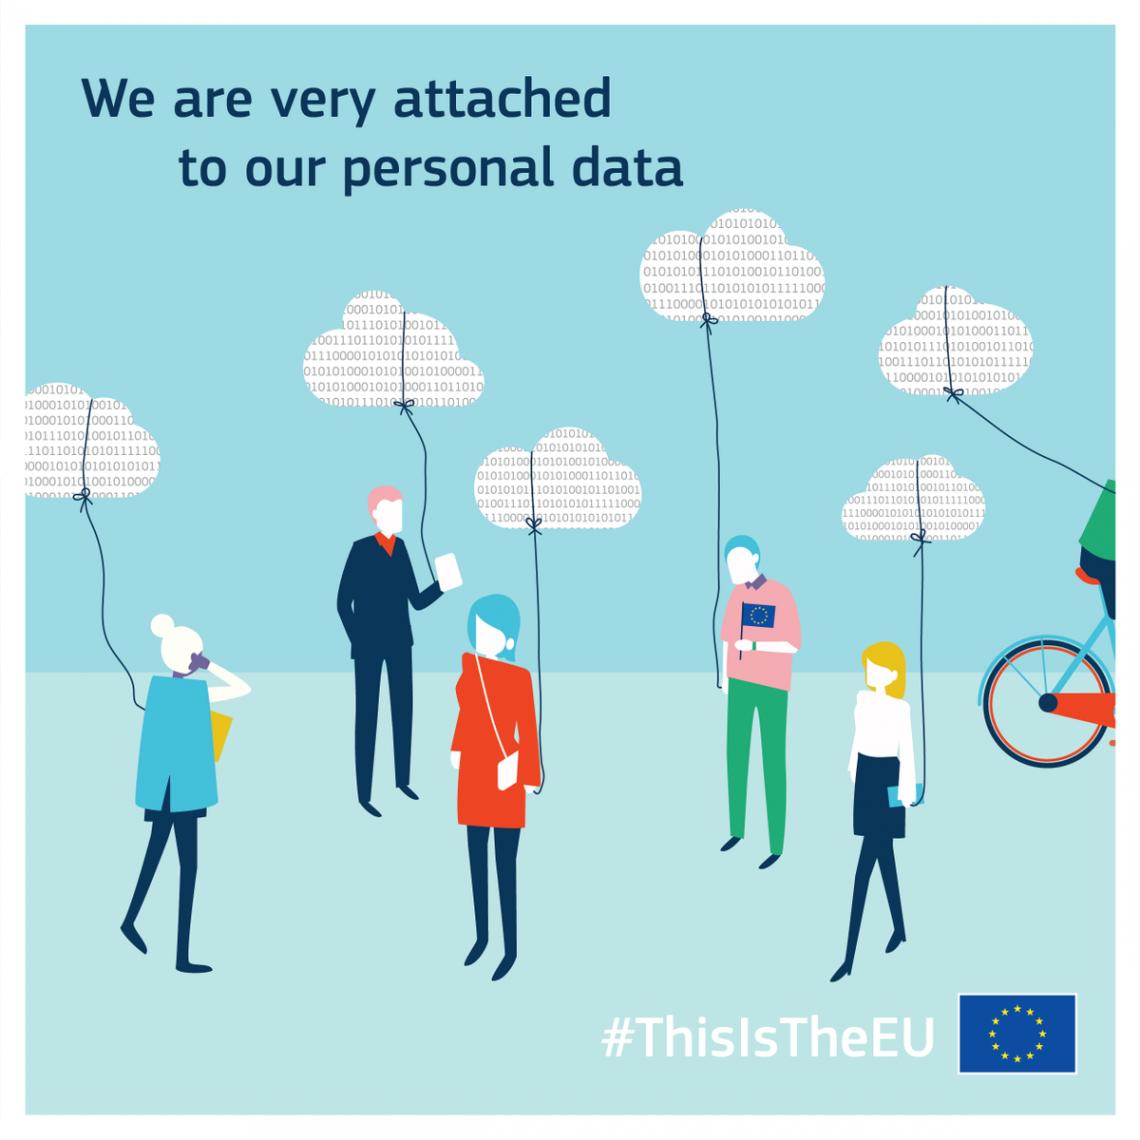 https://ec.europa.eu/commission/news/general-data-protection-regulation-enters-application-2018-may-25_de